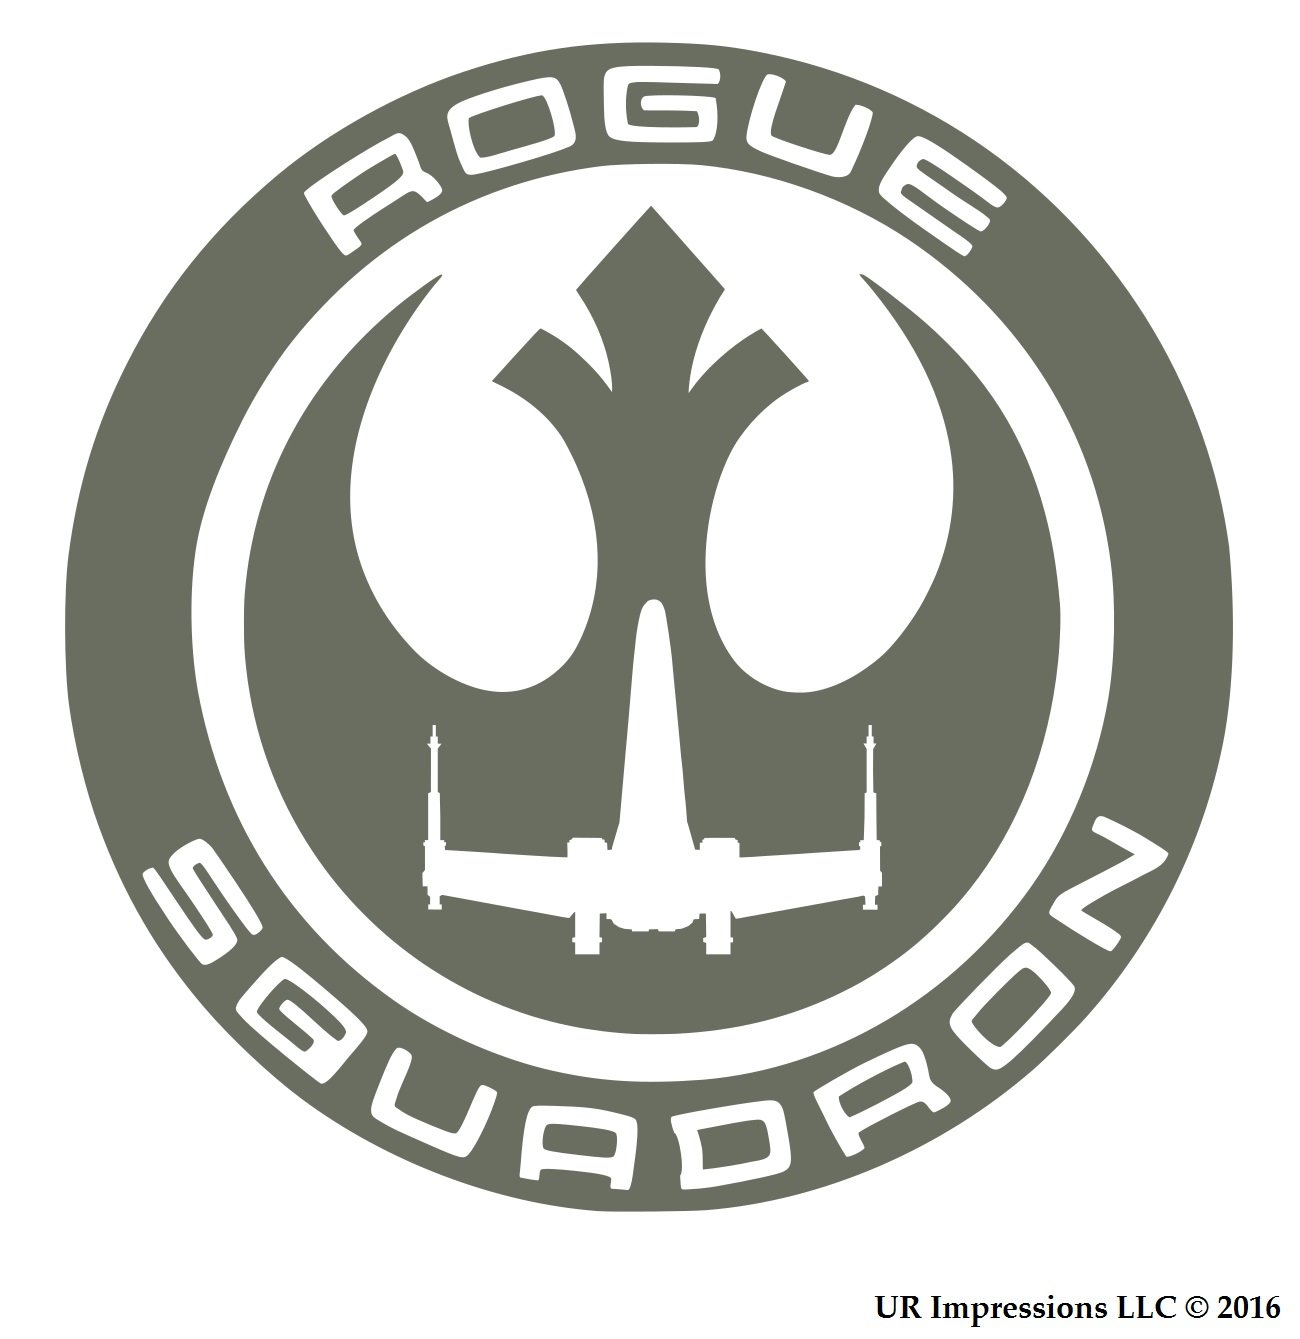 Gry Rogue Squadron Star Wars Inspiredデカールビニールsticker|cars Trucks壁laptop|gray|5.5 in|uri457   B0762CDK8V